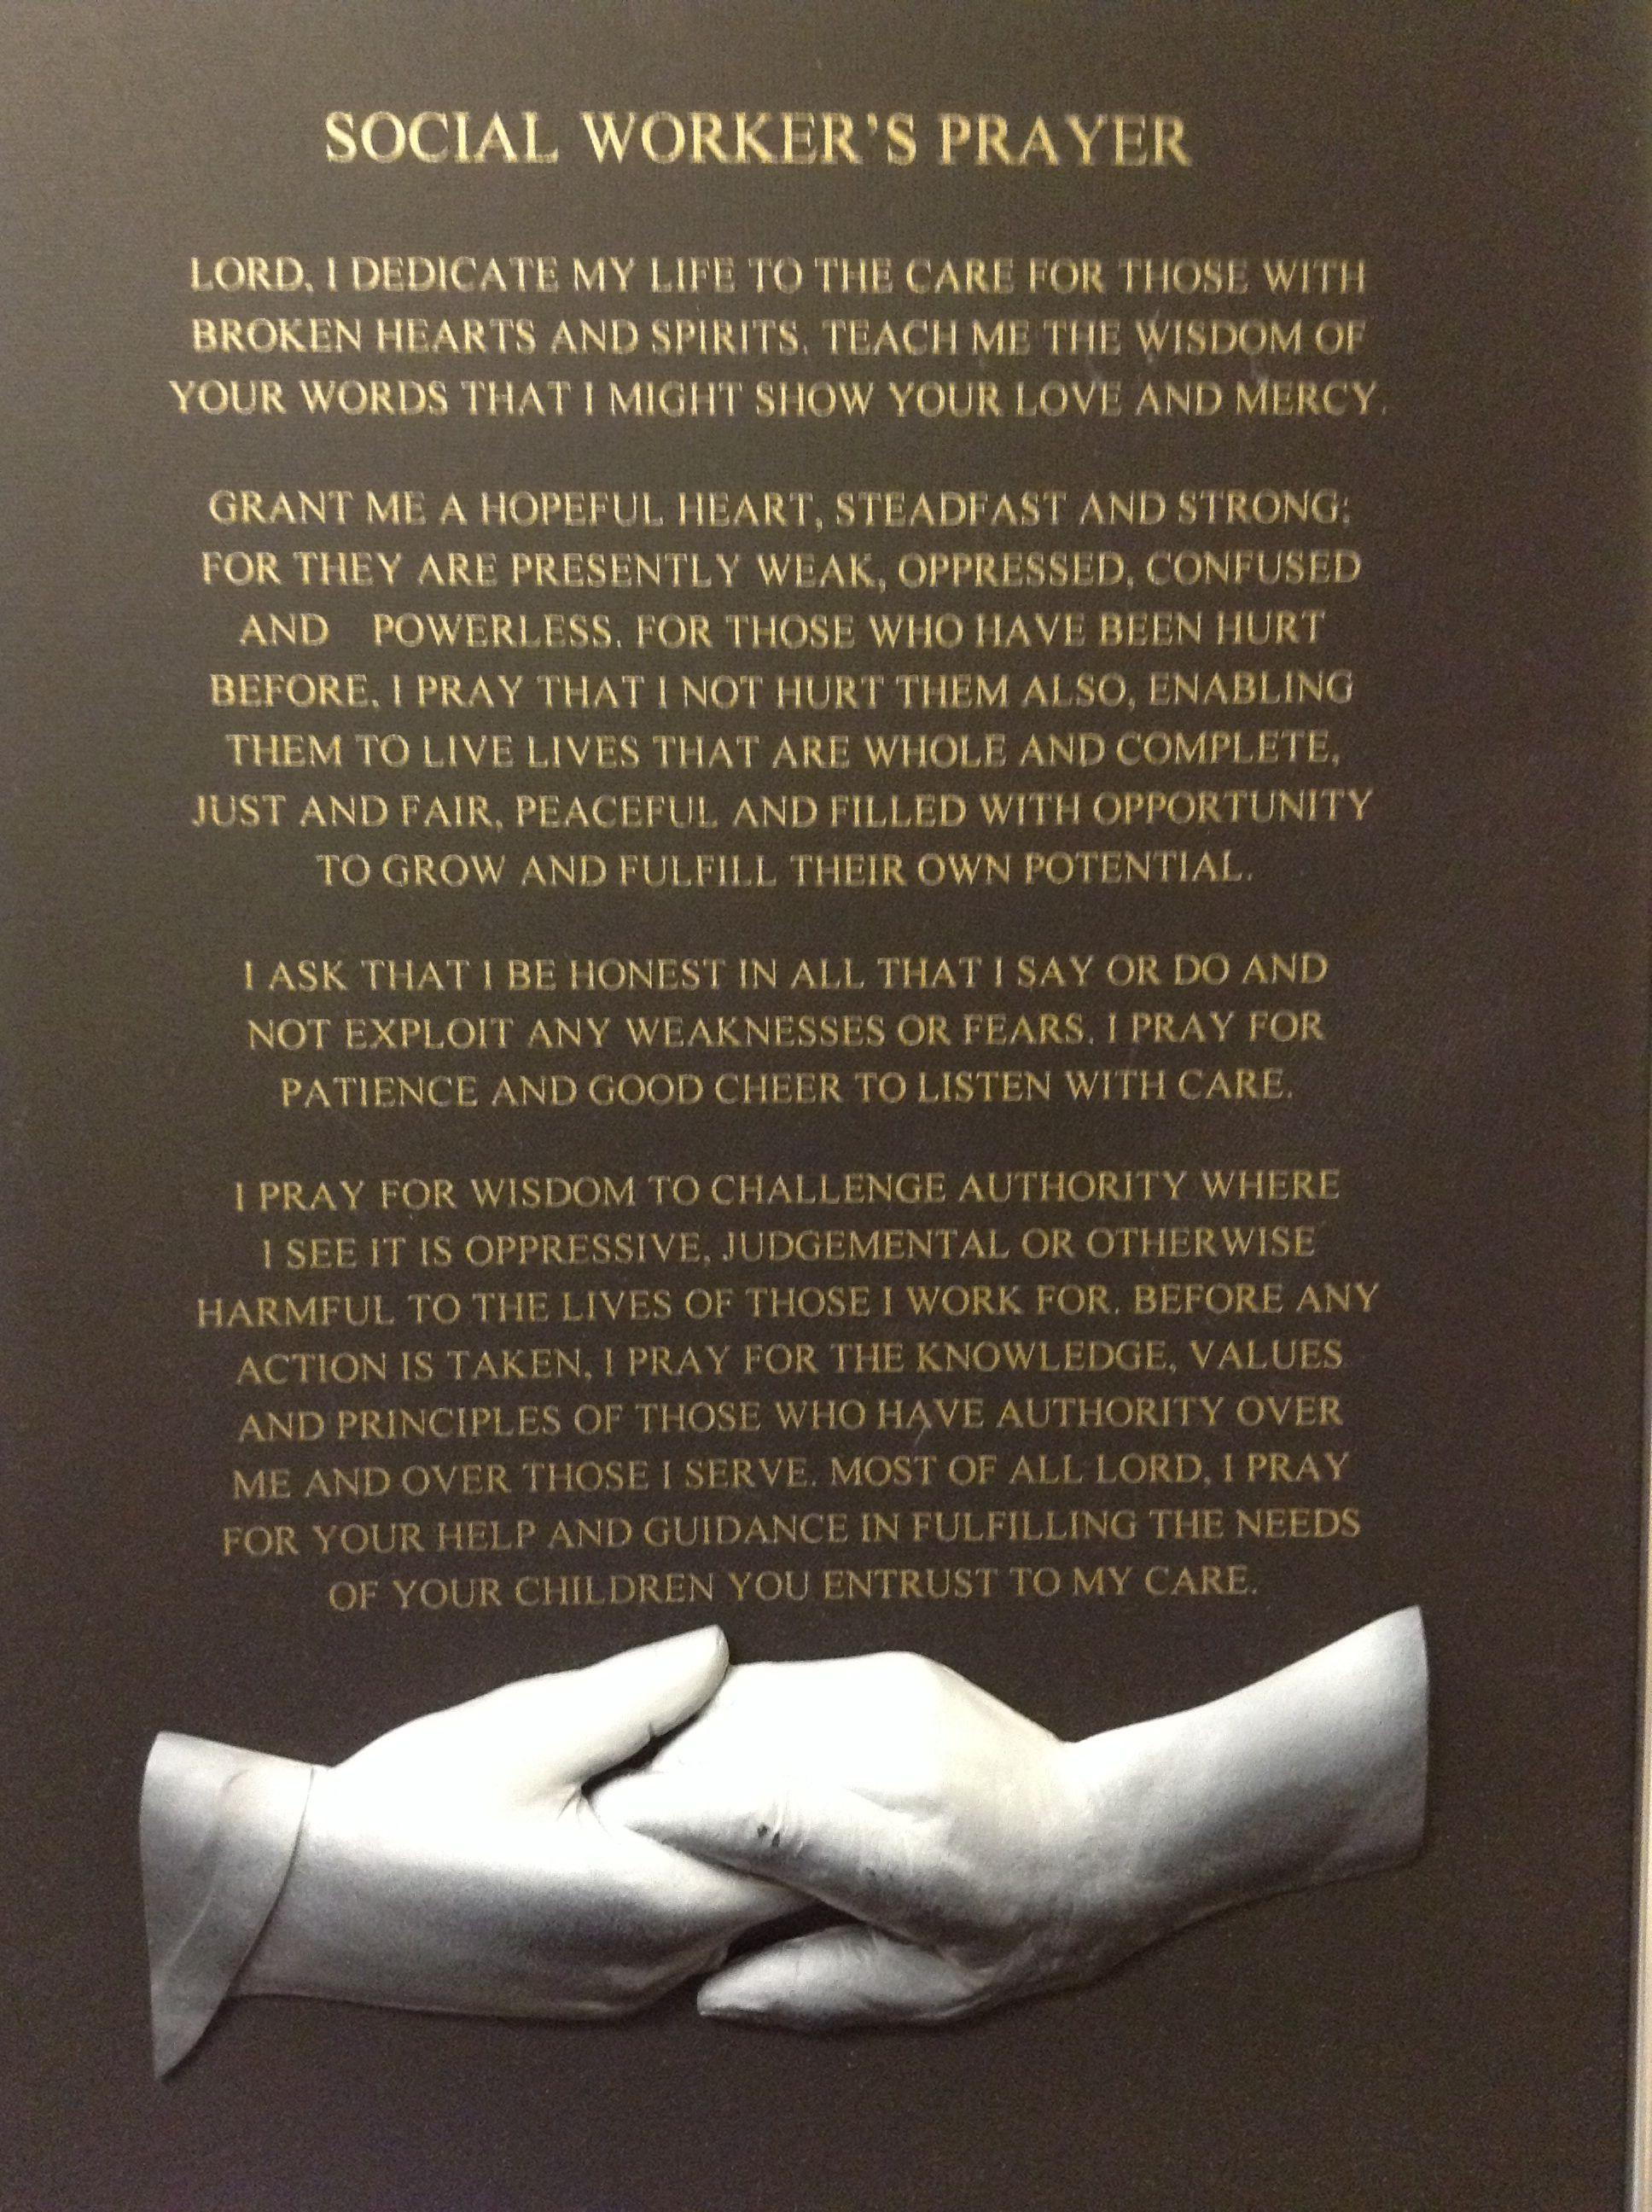 Social Worker's Prayer S.w. Pinterest Beautiful